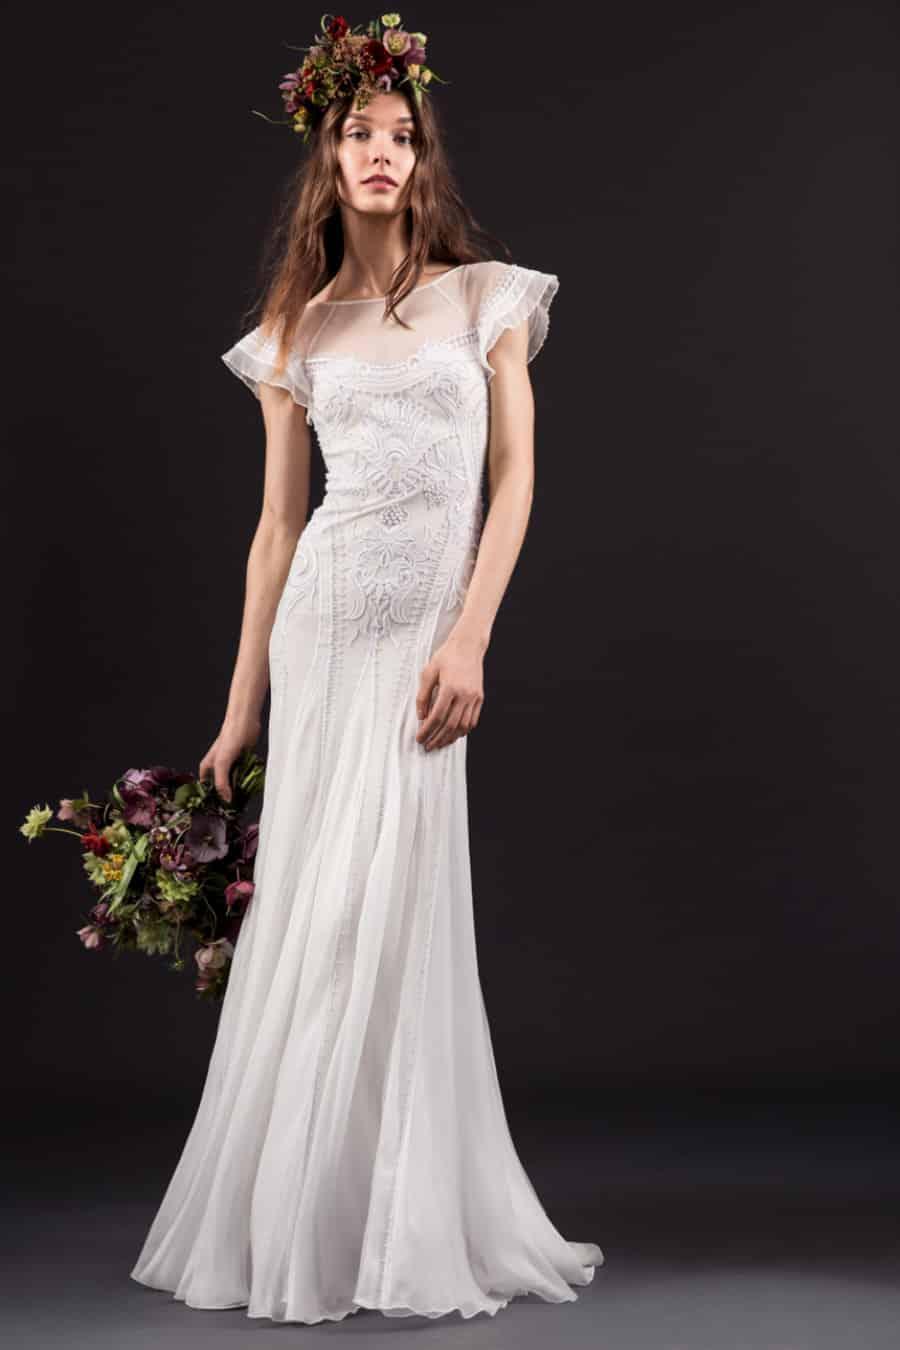 10 incroyables robes de mari e proposer meghan markle for Robe pour le mariage de printemps